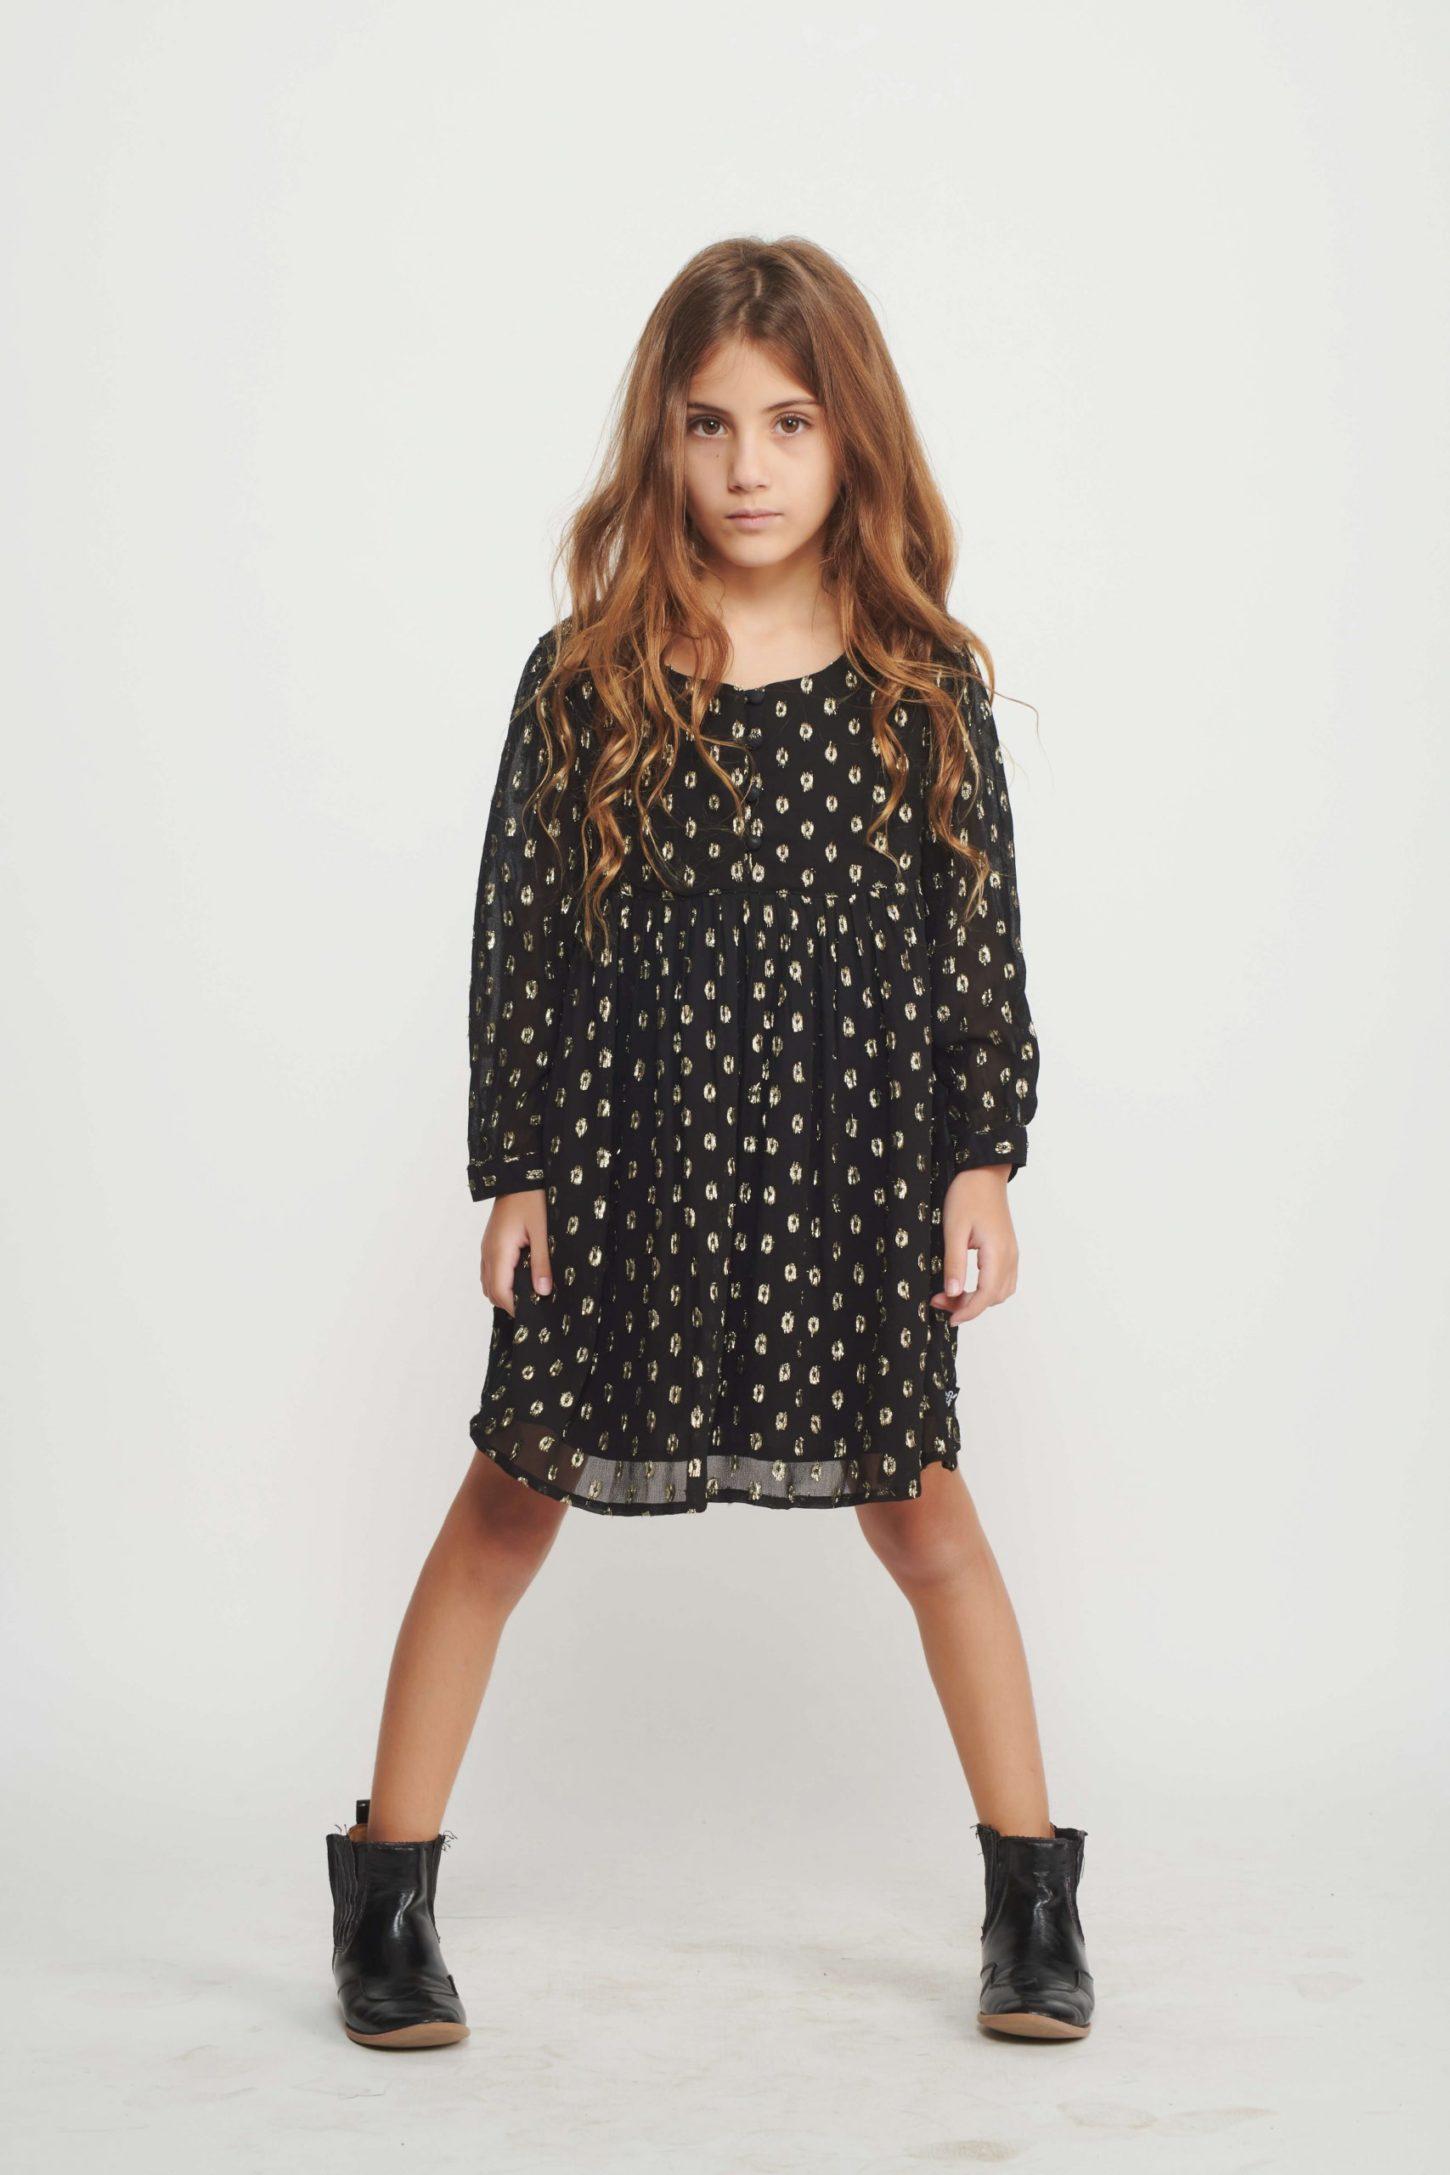 black polka dress